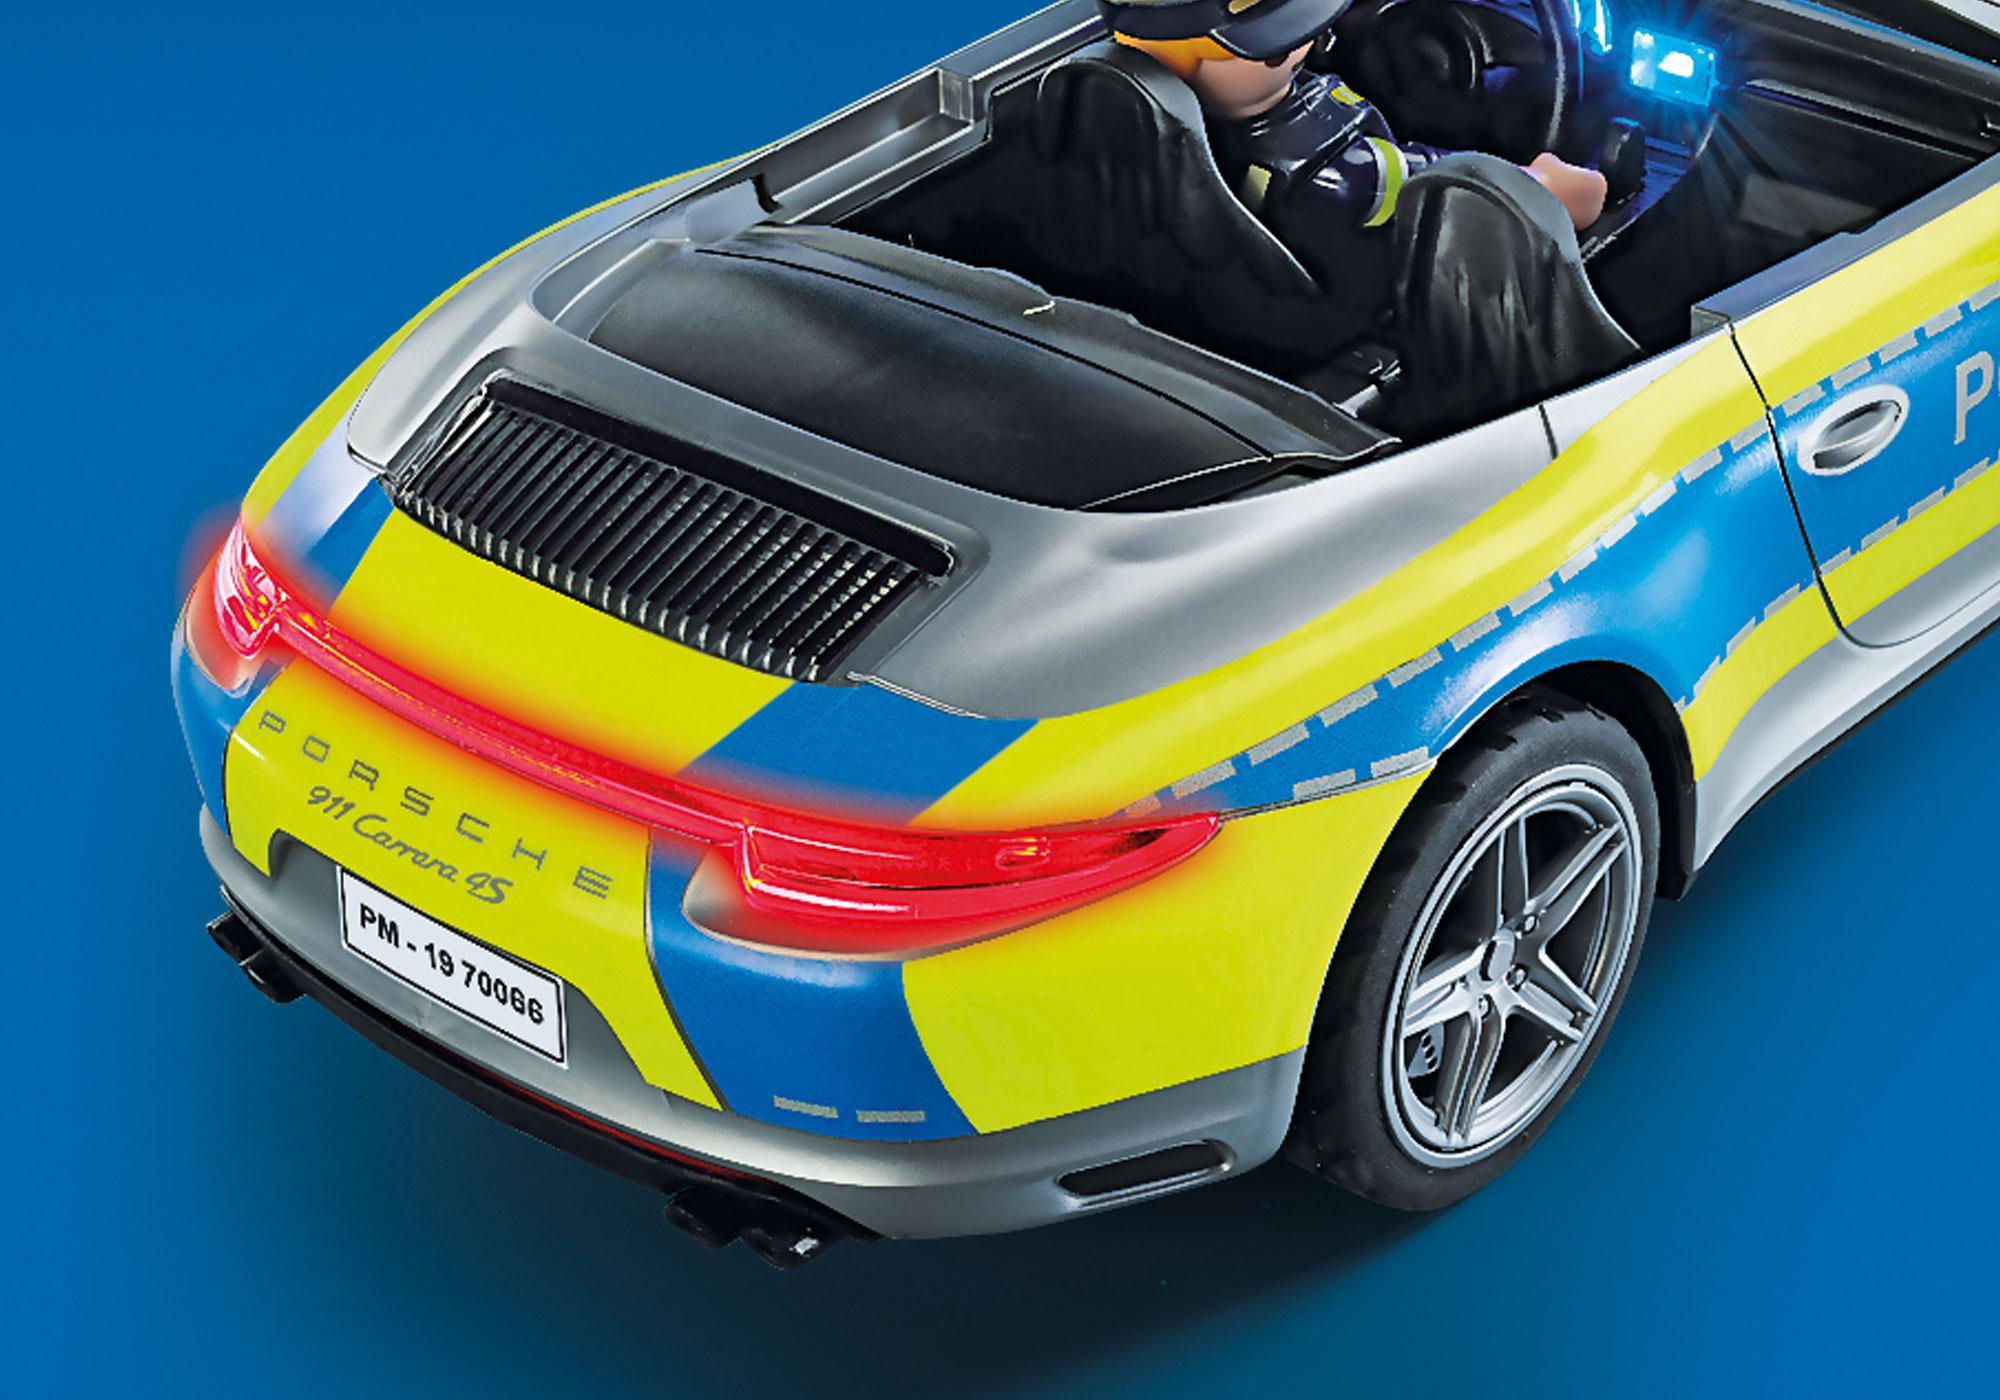 http://media.playmobil.com/i/playmobil/70066_product_extra3/Porsche 911 Carrera 4S Politi